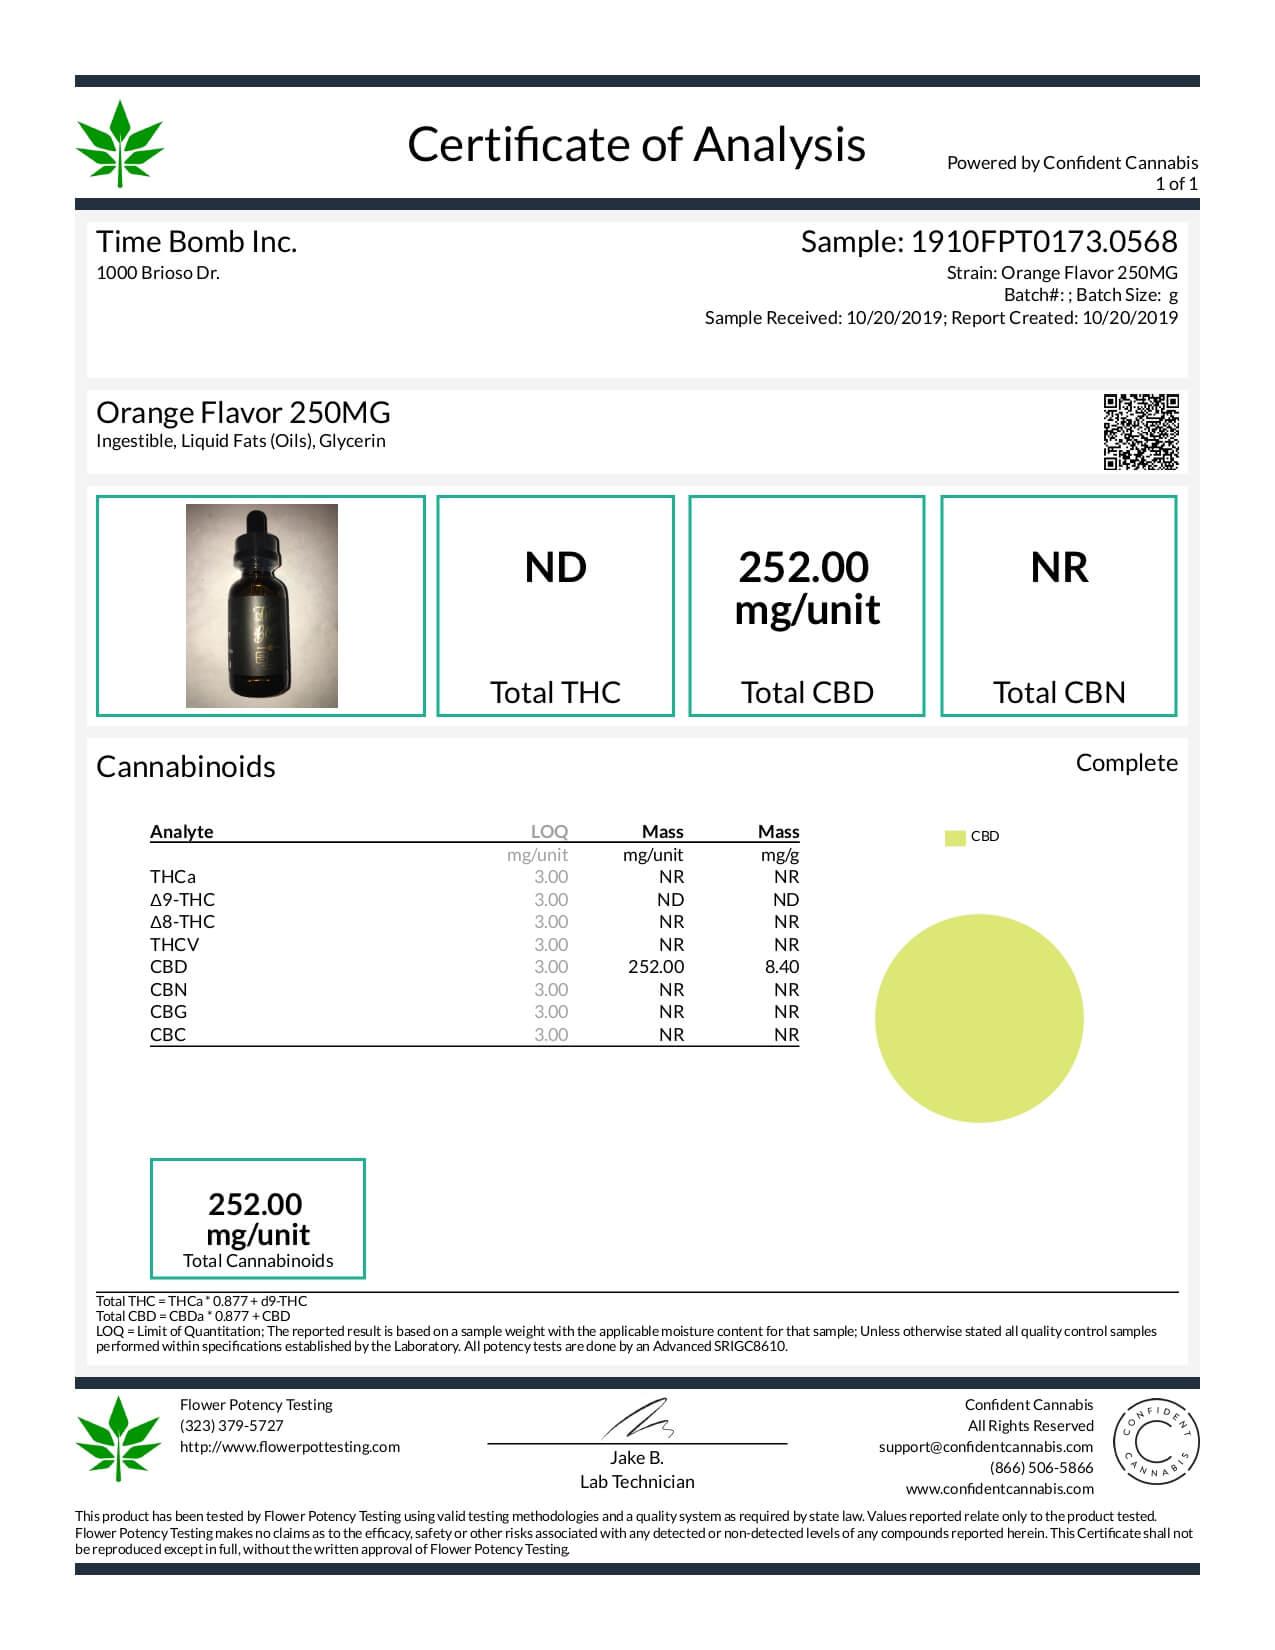 Time Bomb Extracts CBD Tincture Orange 250mg Lab Report